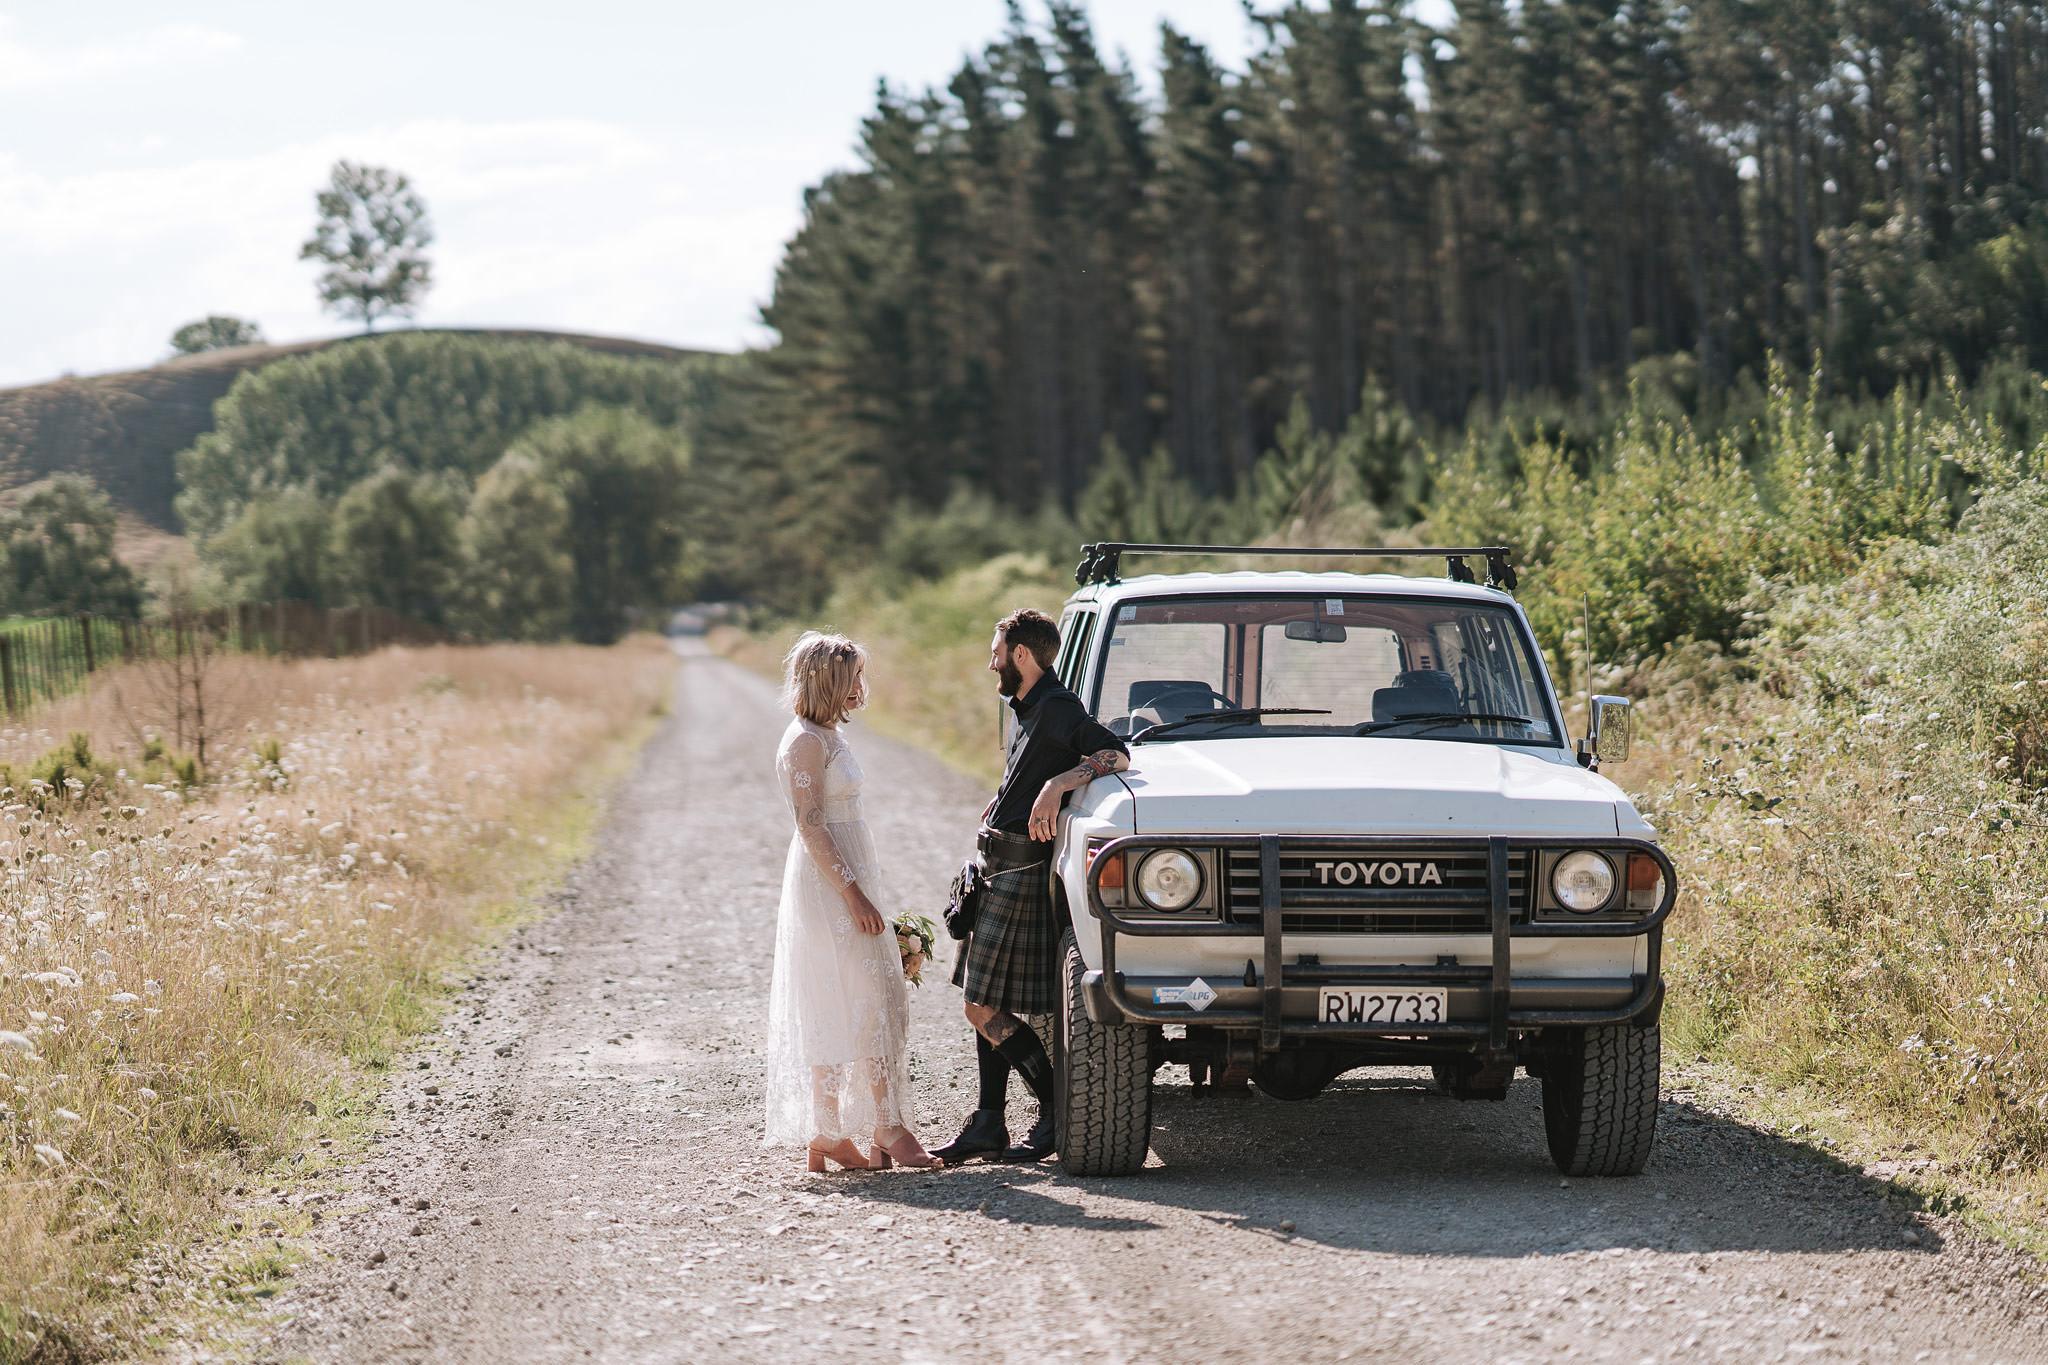 rambo-estrada-natalieryan-1old-forest-school-tauranga-wedding-pho.jpeg